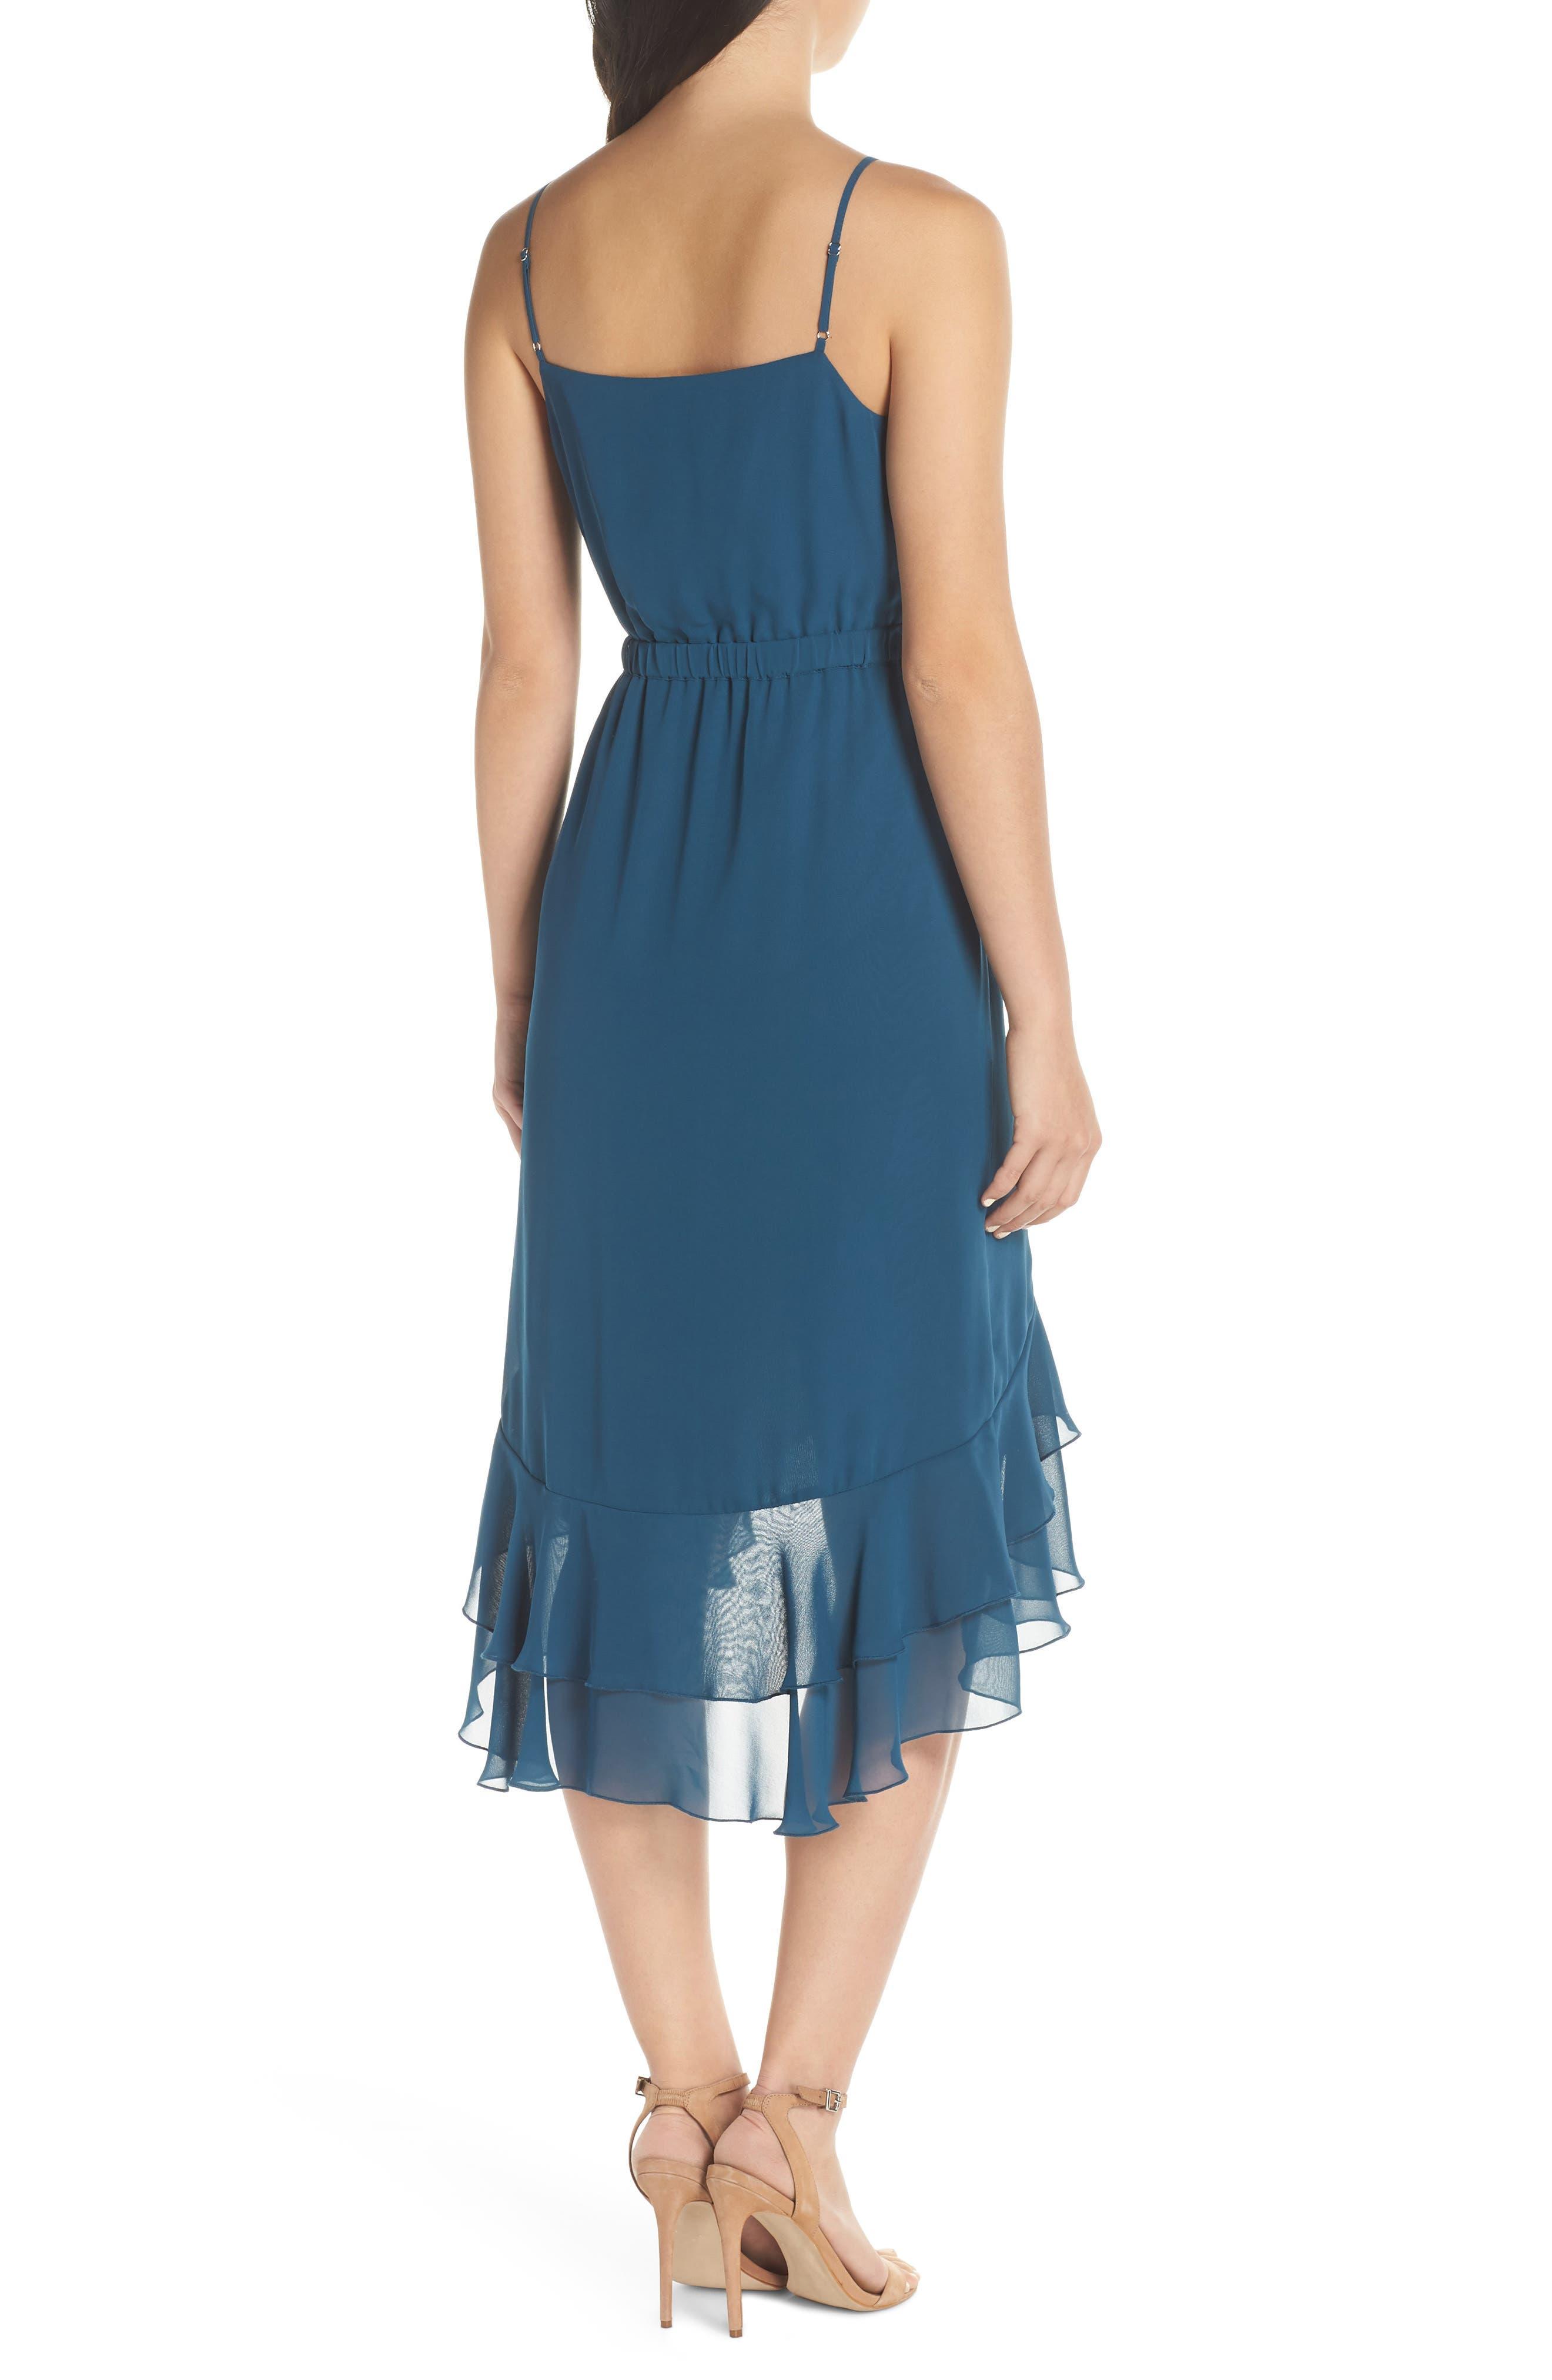 ALI & JAY, Pretty Lady High/Low Dress, Alternate thumbnail 2, color, 400